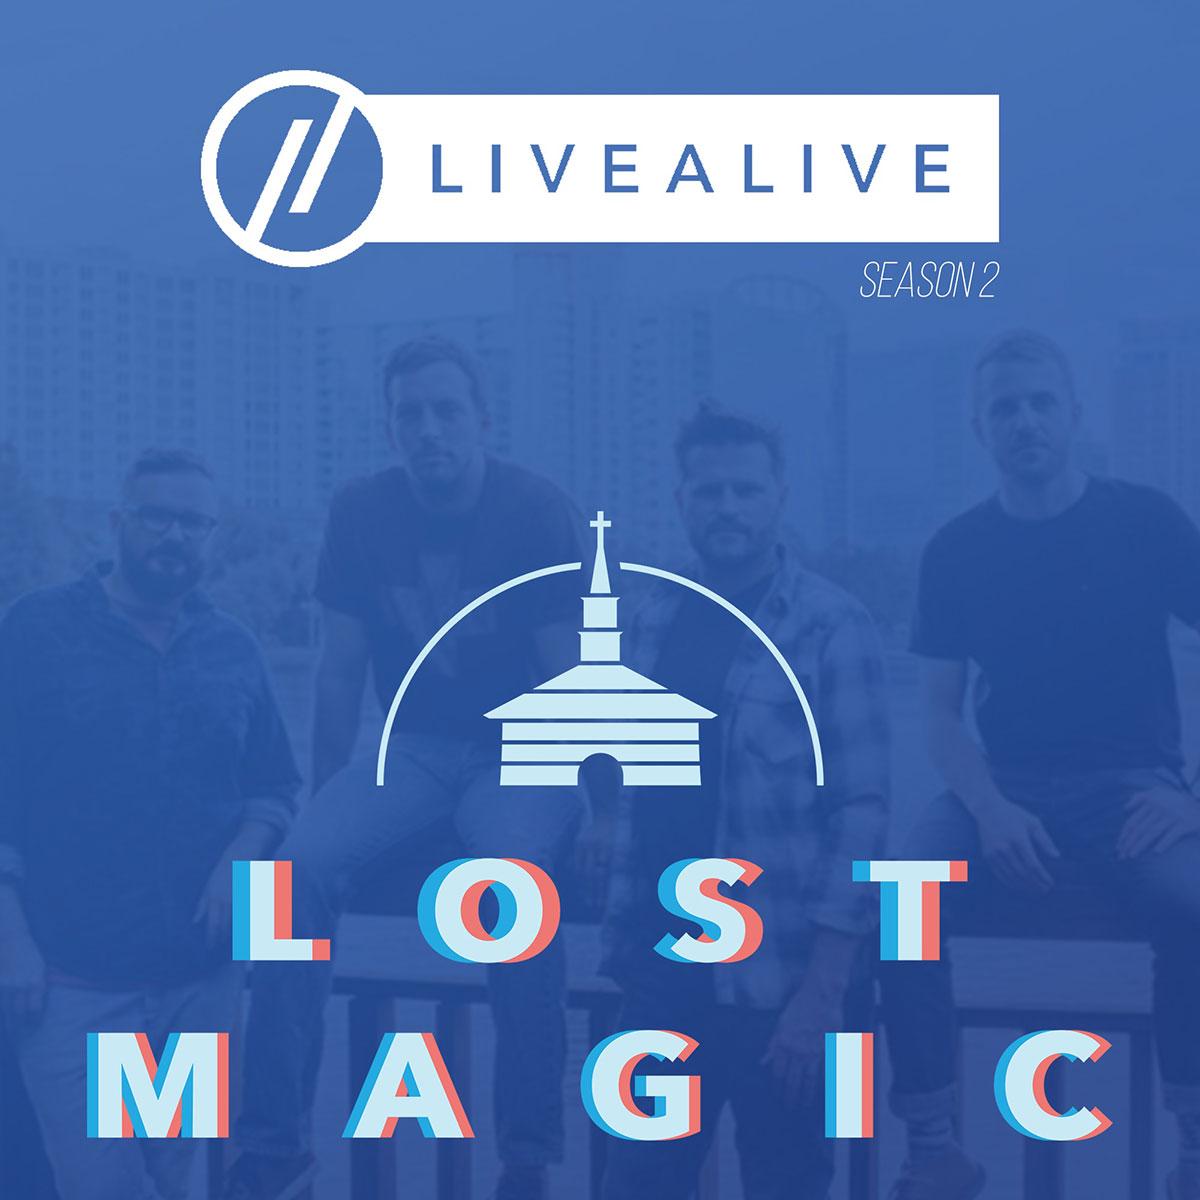 live-alive-season-2-album-art.jpg